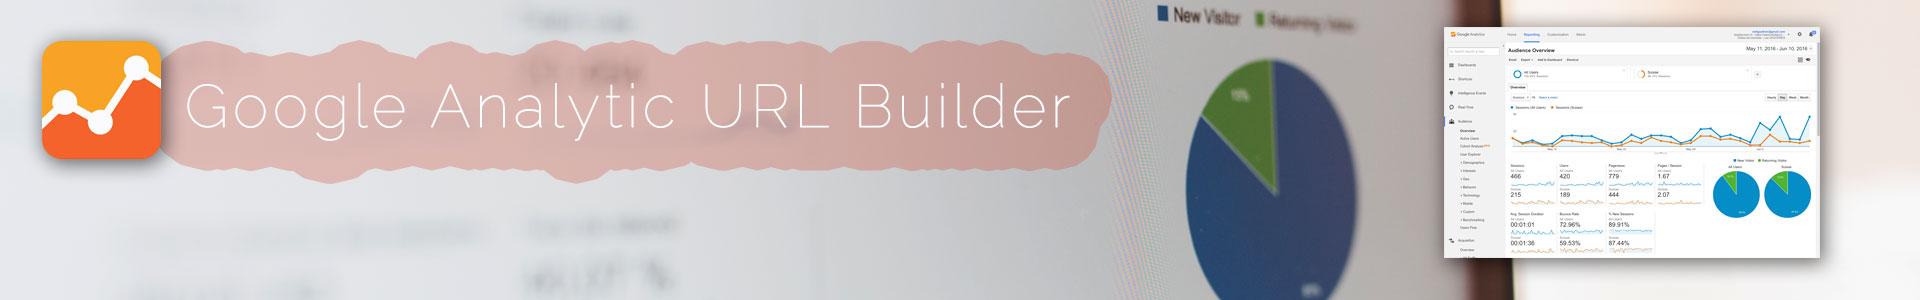 google analytics url builder, outil de création d'url